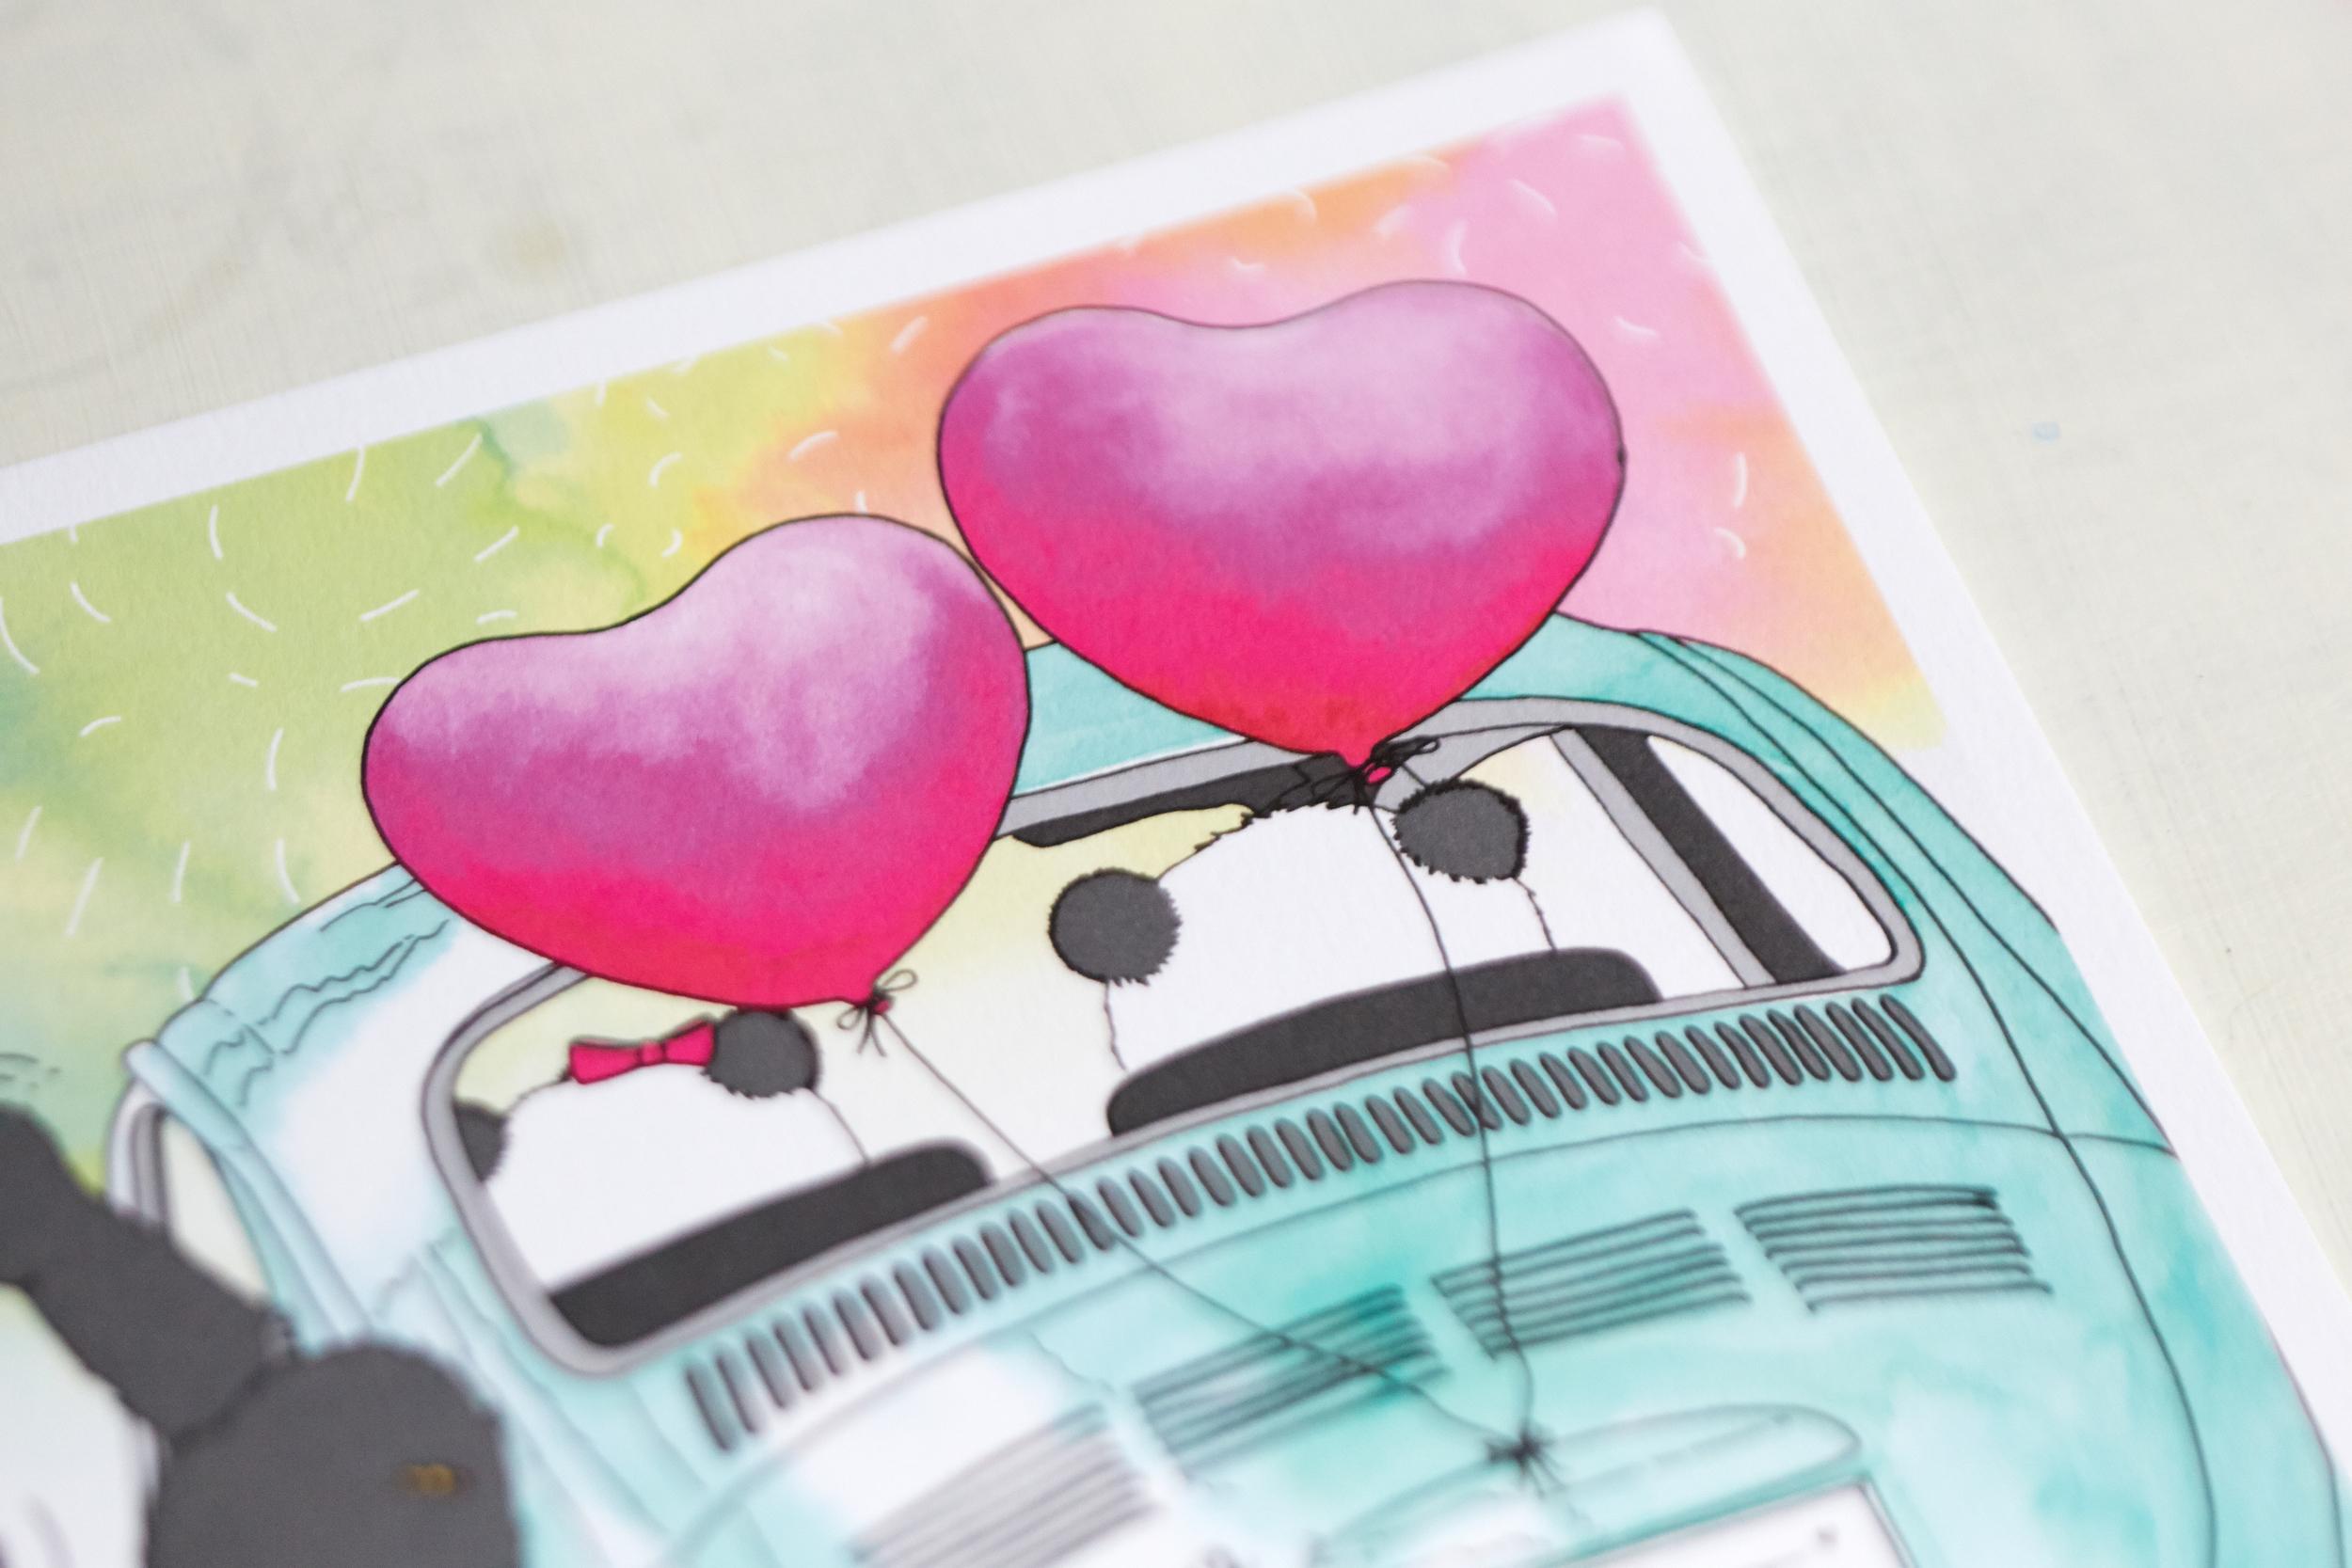 LoveDaddy_Spread12_Details_02.jpg